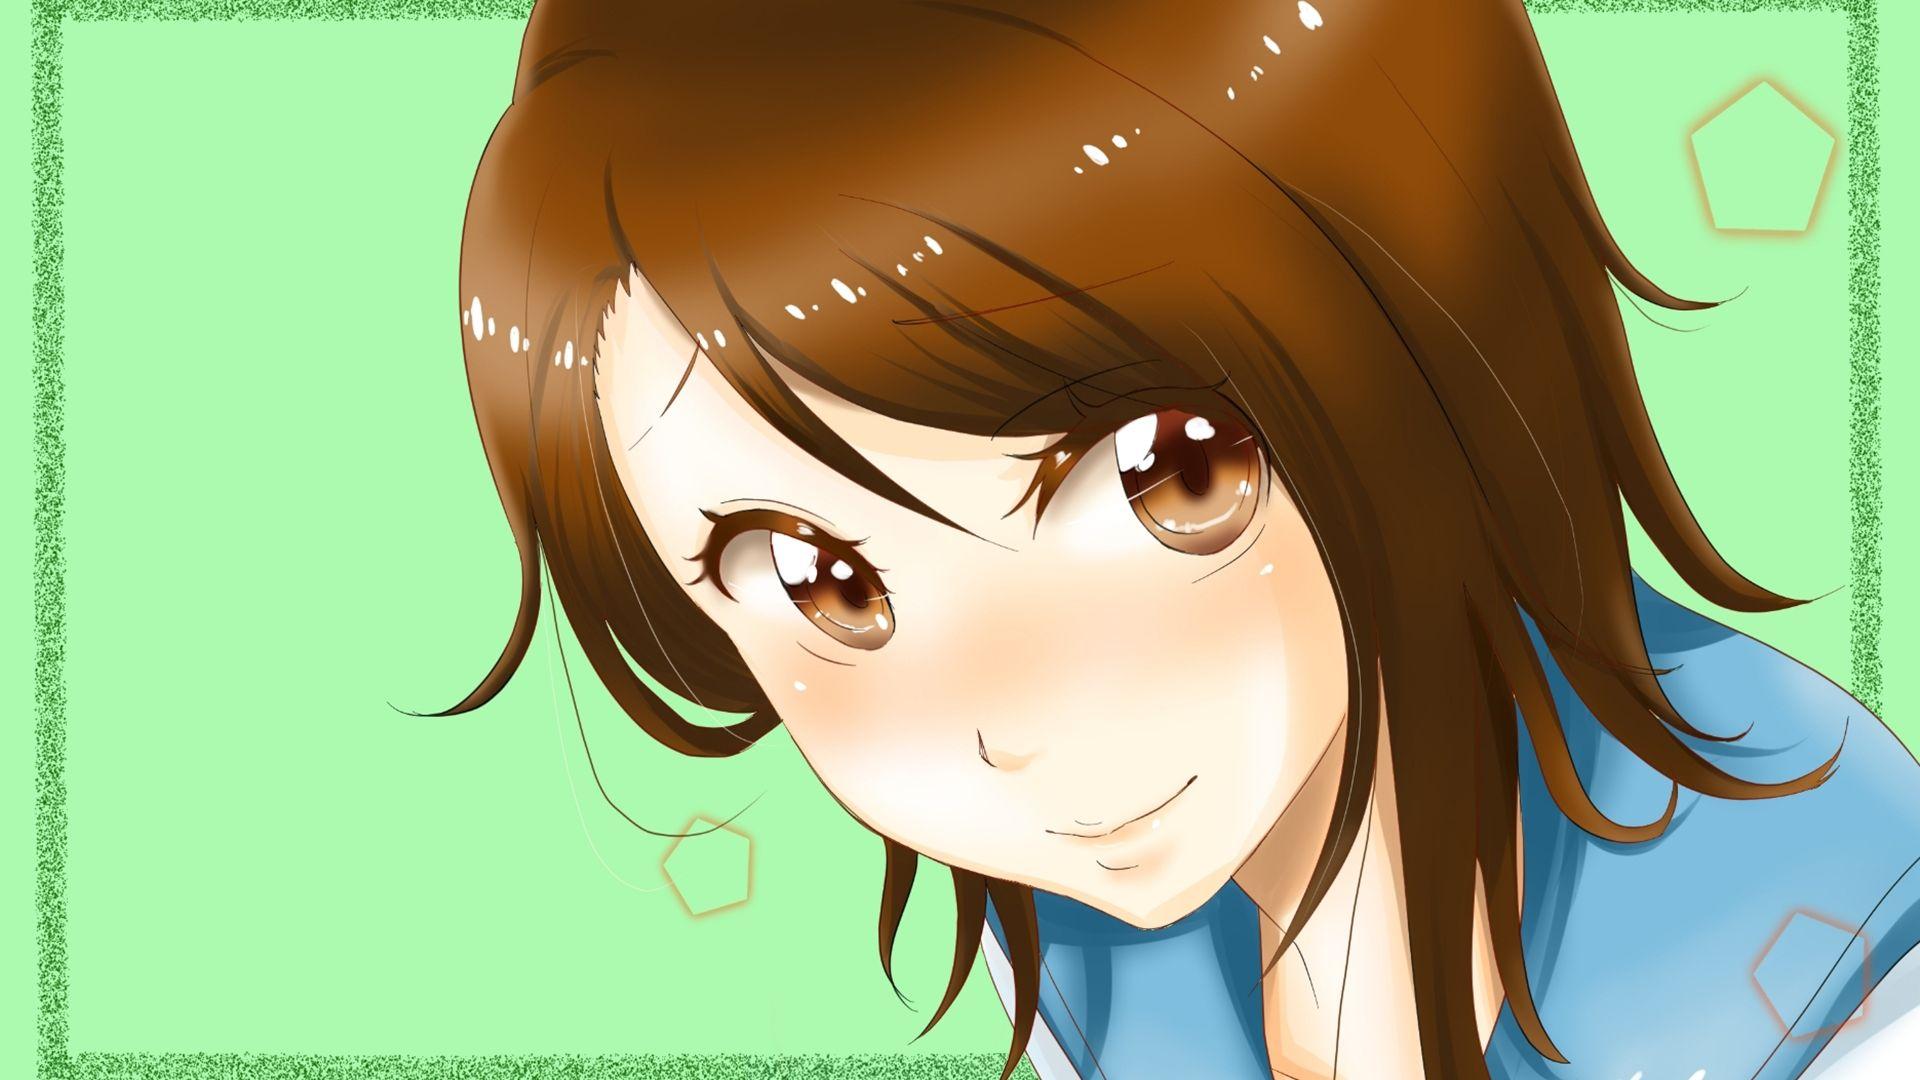 Wallpaper Kosaki Onodera, Nisekoipedia, beautiful face